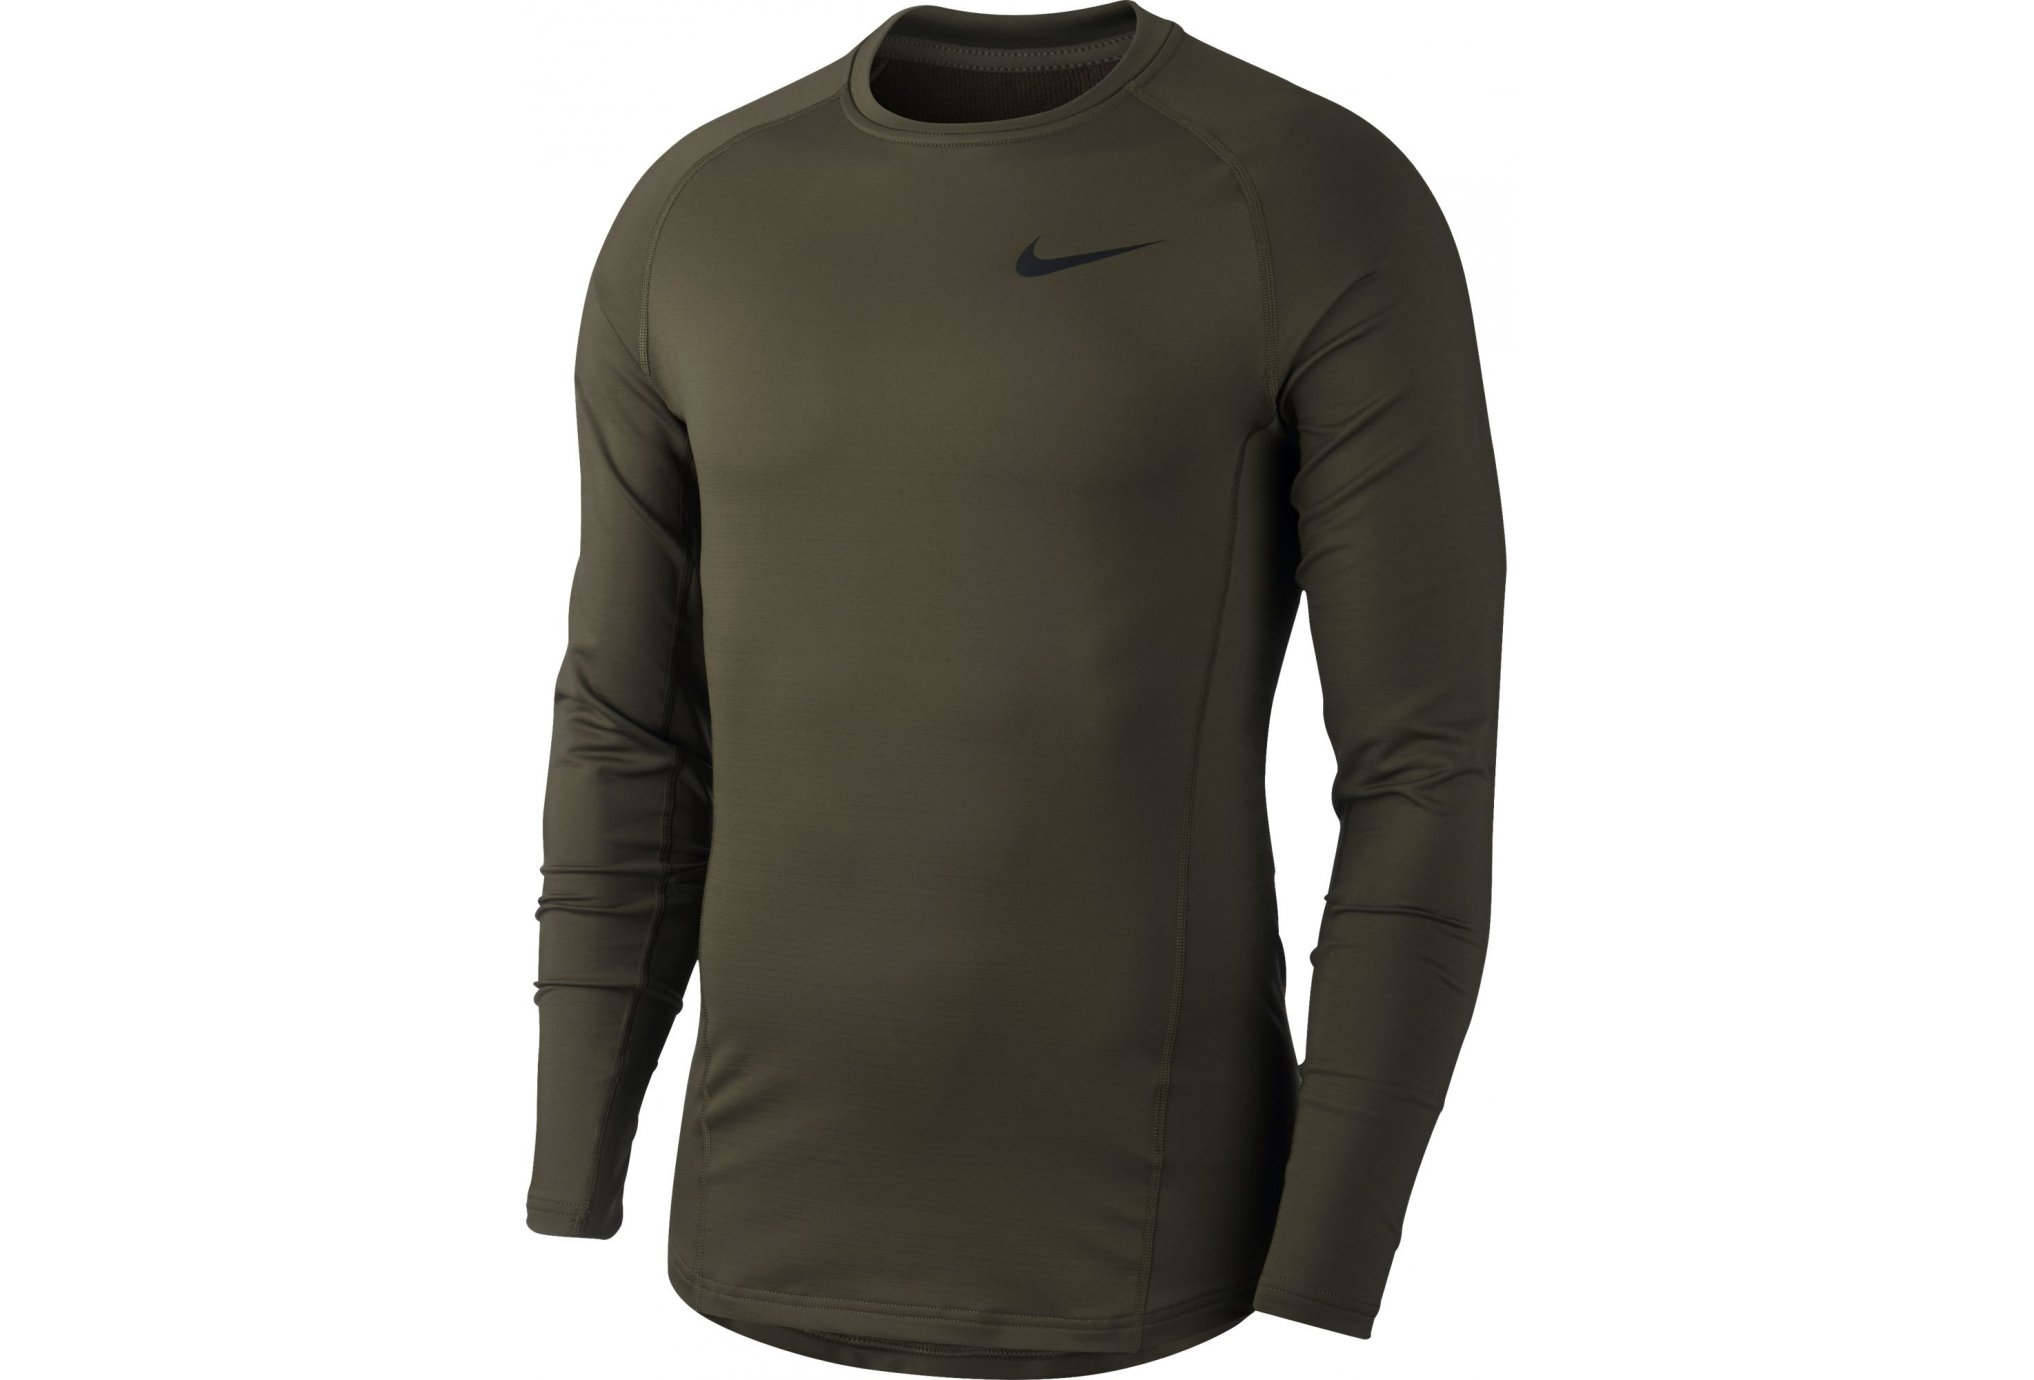 Trail Session - Nike Pro Warm M vêtement running homme 3a1395b91126